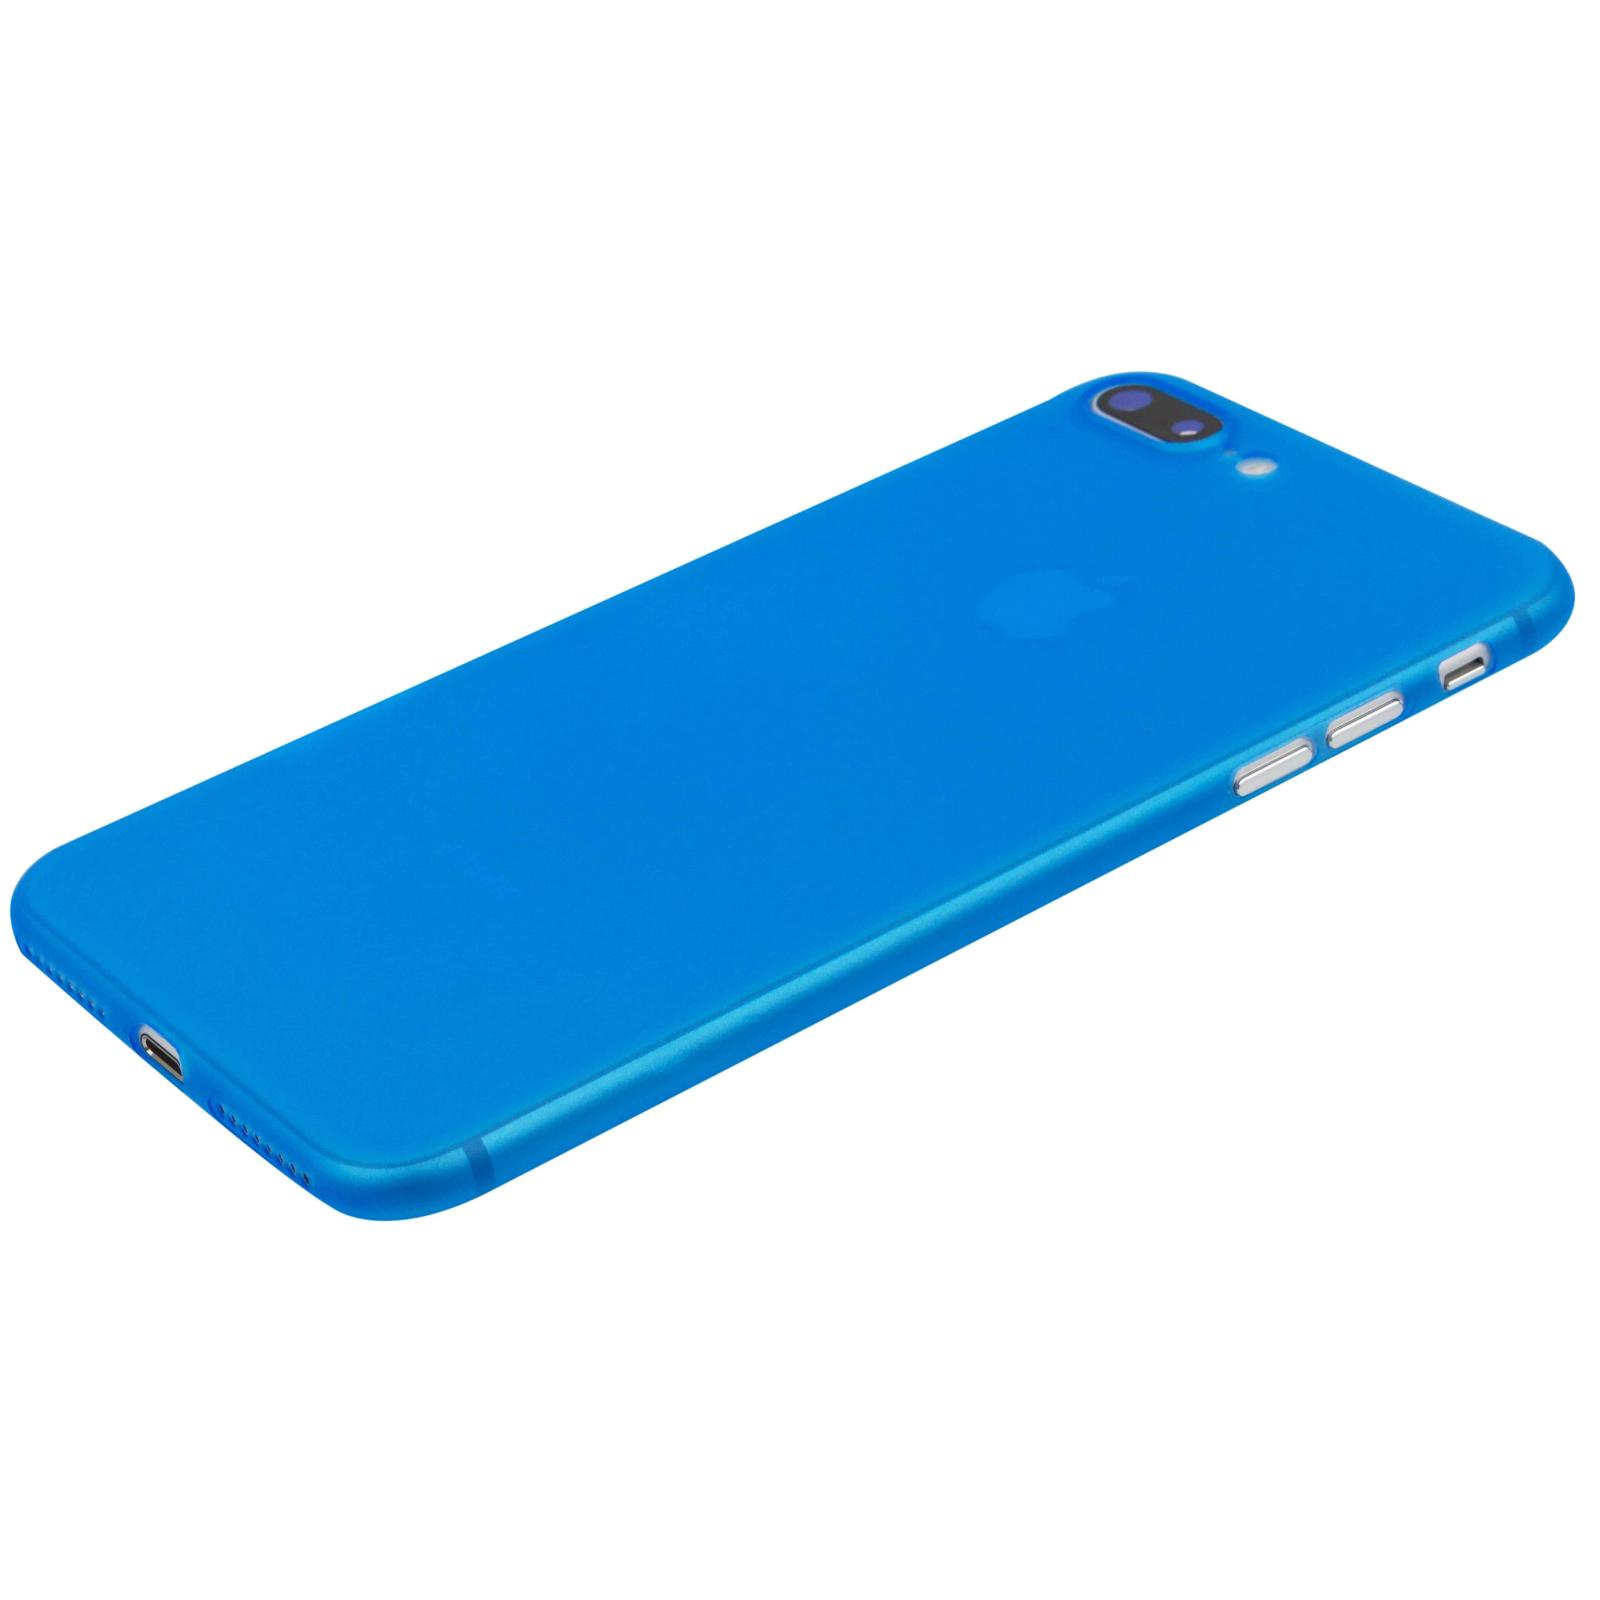 Чехол для моб. телефона MakeFuture PP/Ice Case для Apple iPhone 8 Plus Blue (MCI-AI8PBL) изображение 3